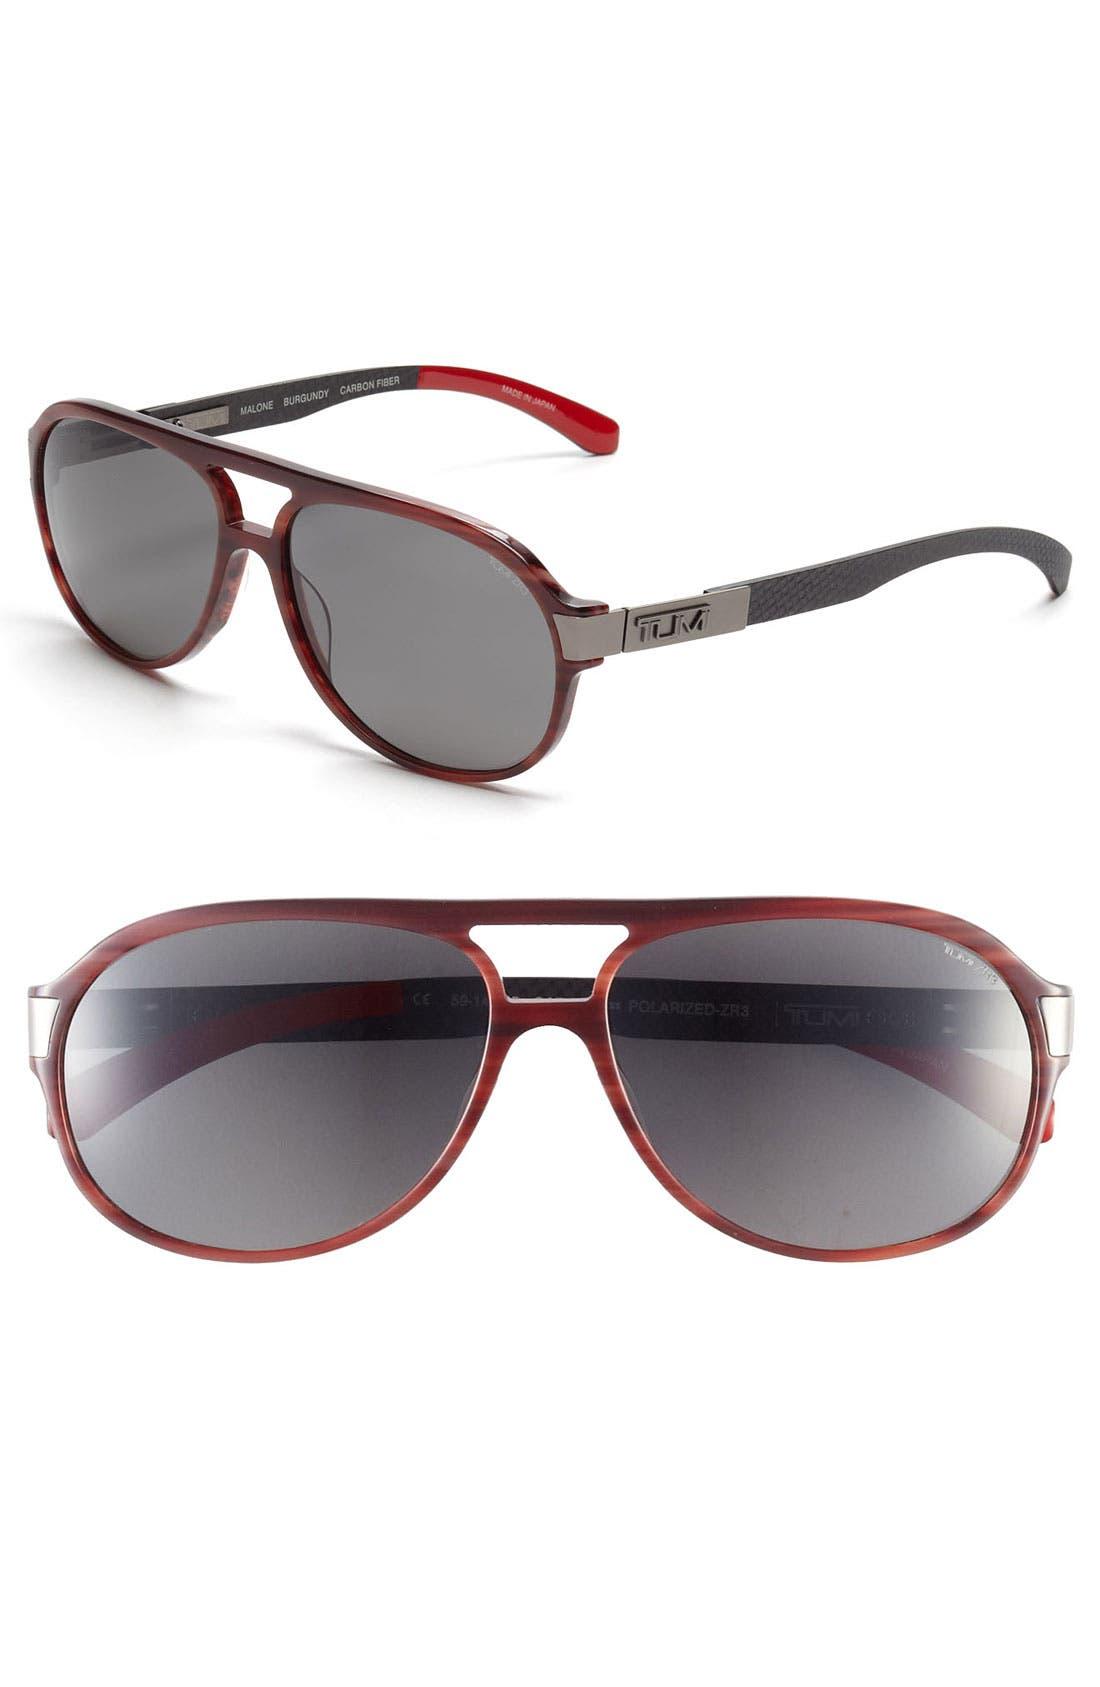 Alternate Image 1 Selected - Tumi 'Malone' 59mm Polarized Sunglasses